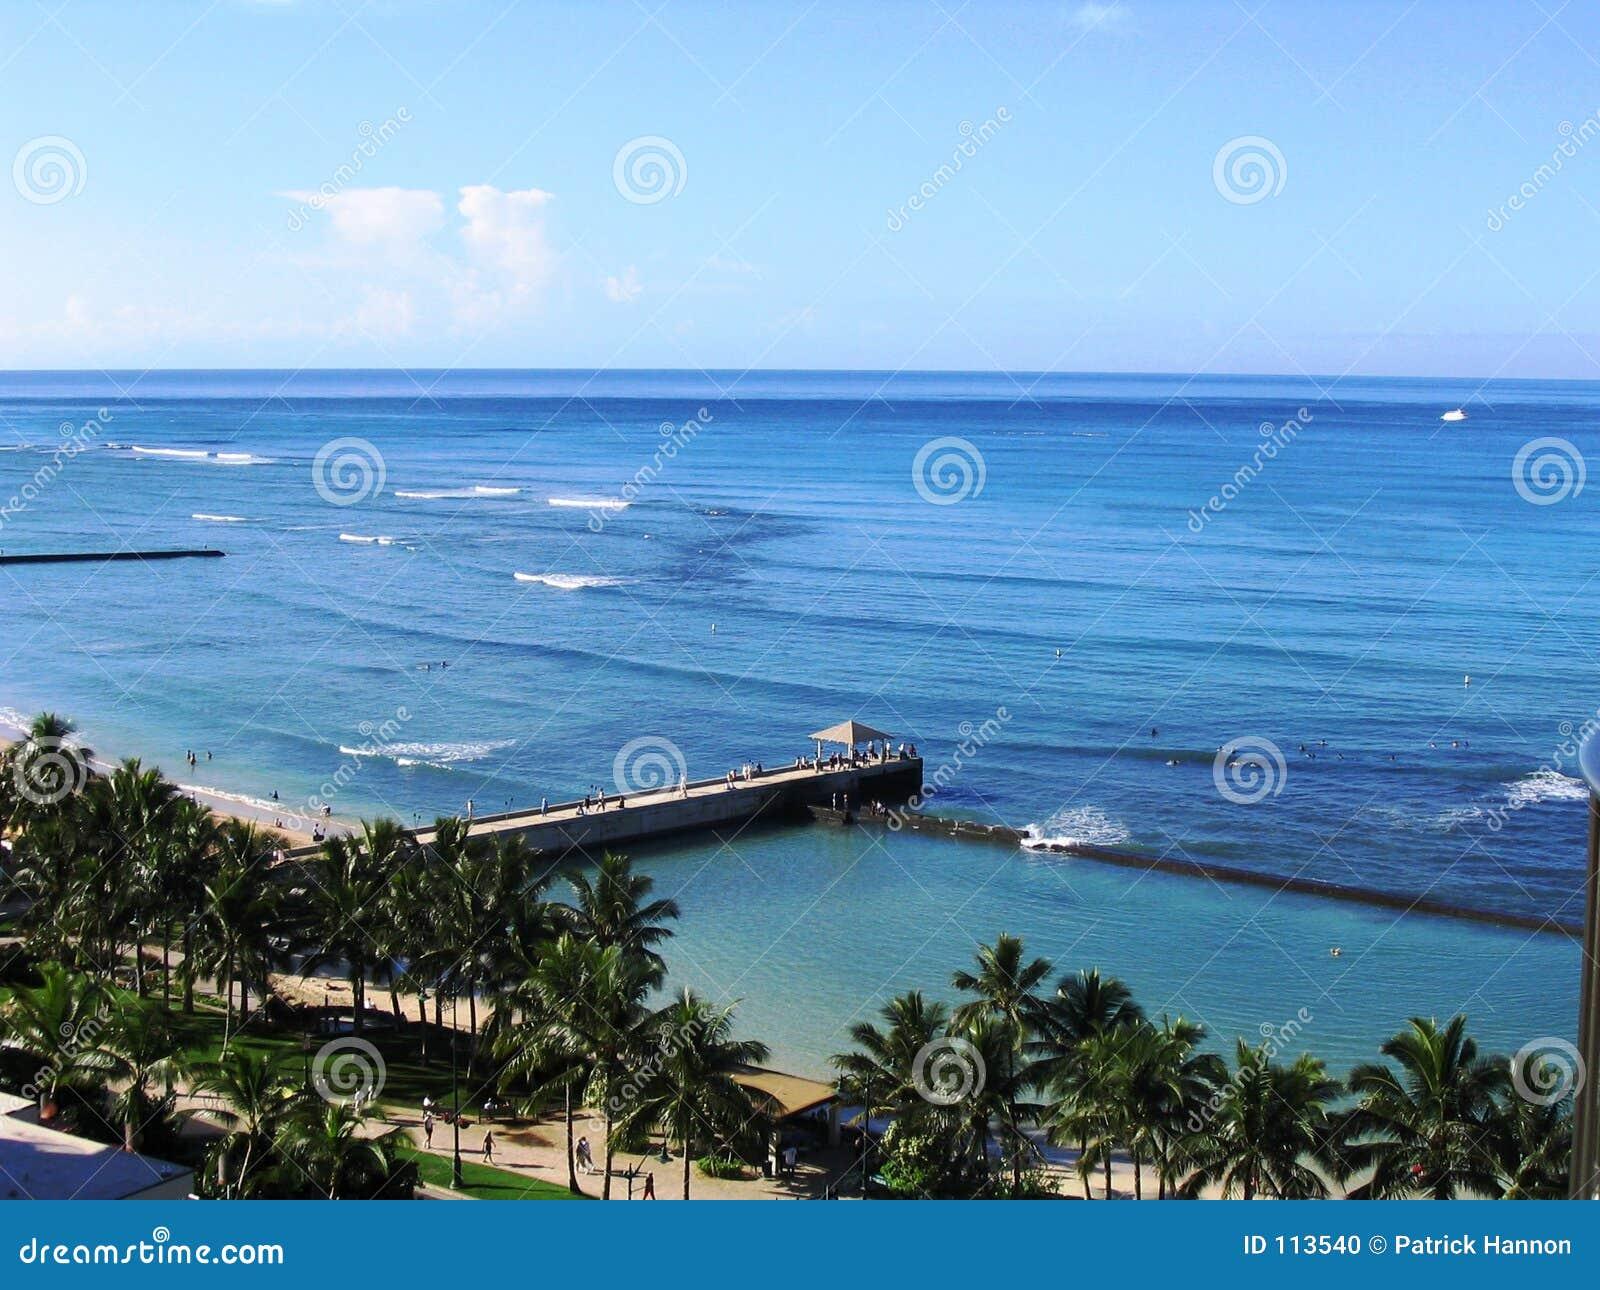 Download Waikiki Pier stock photo. Image of relaxation, palmtrees - 113540